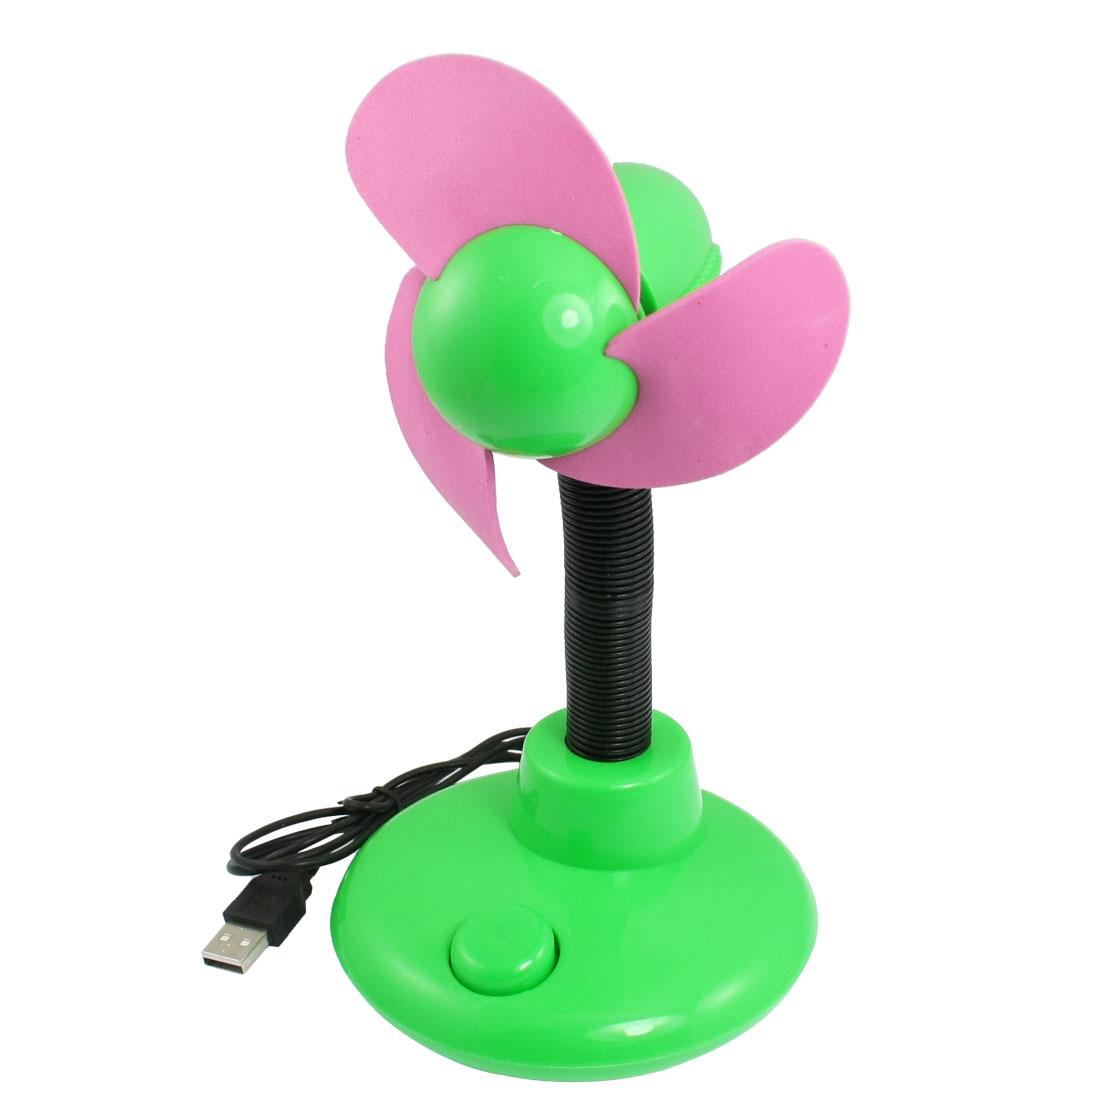 Pink Foam Paddle Round Base Adjustable Neck USB Fan Green